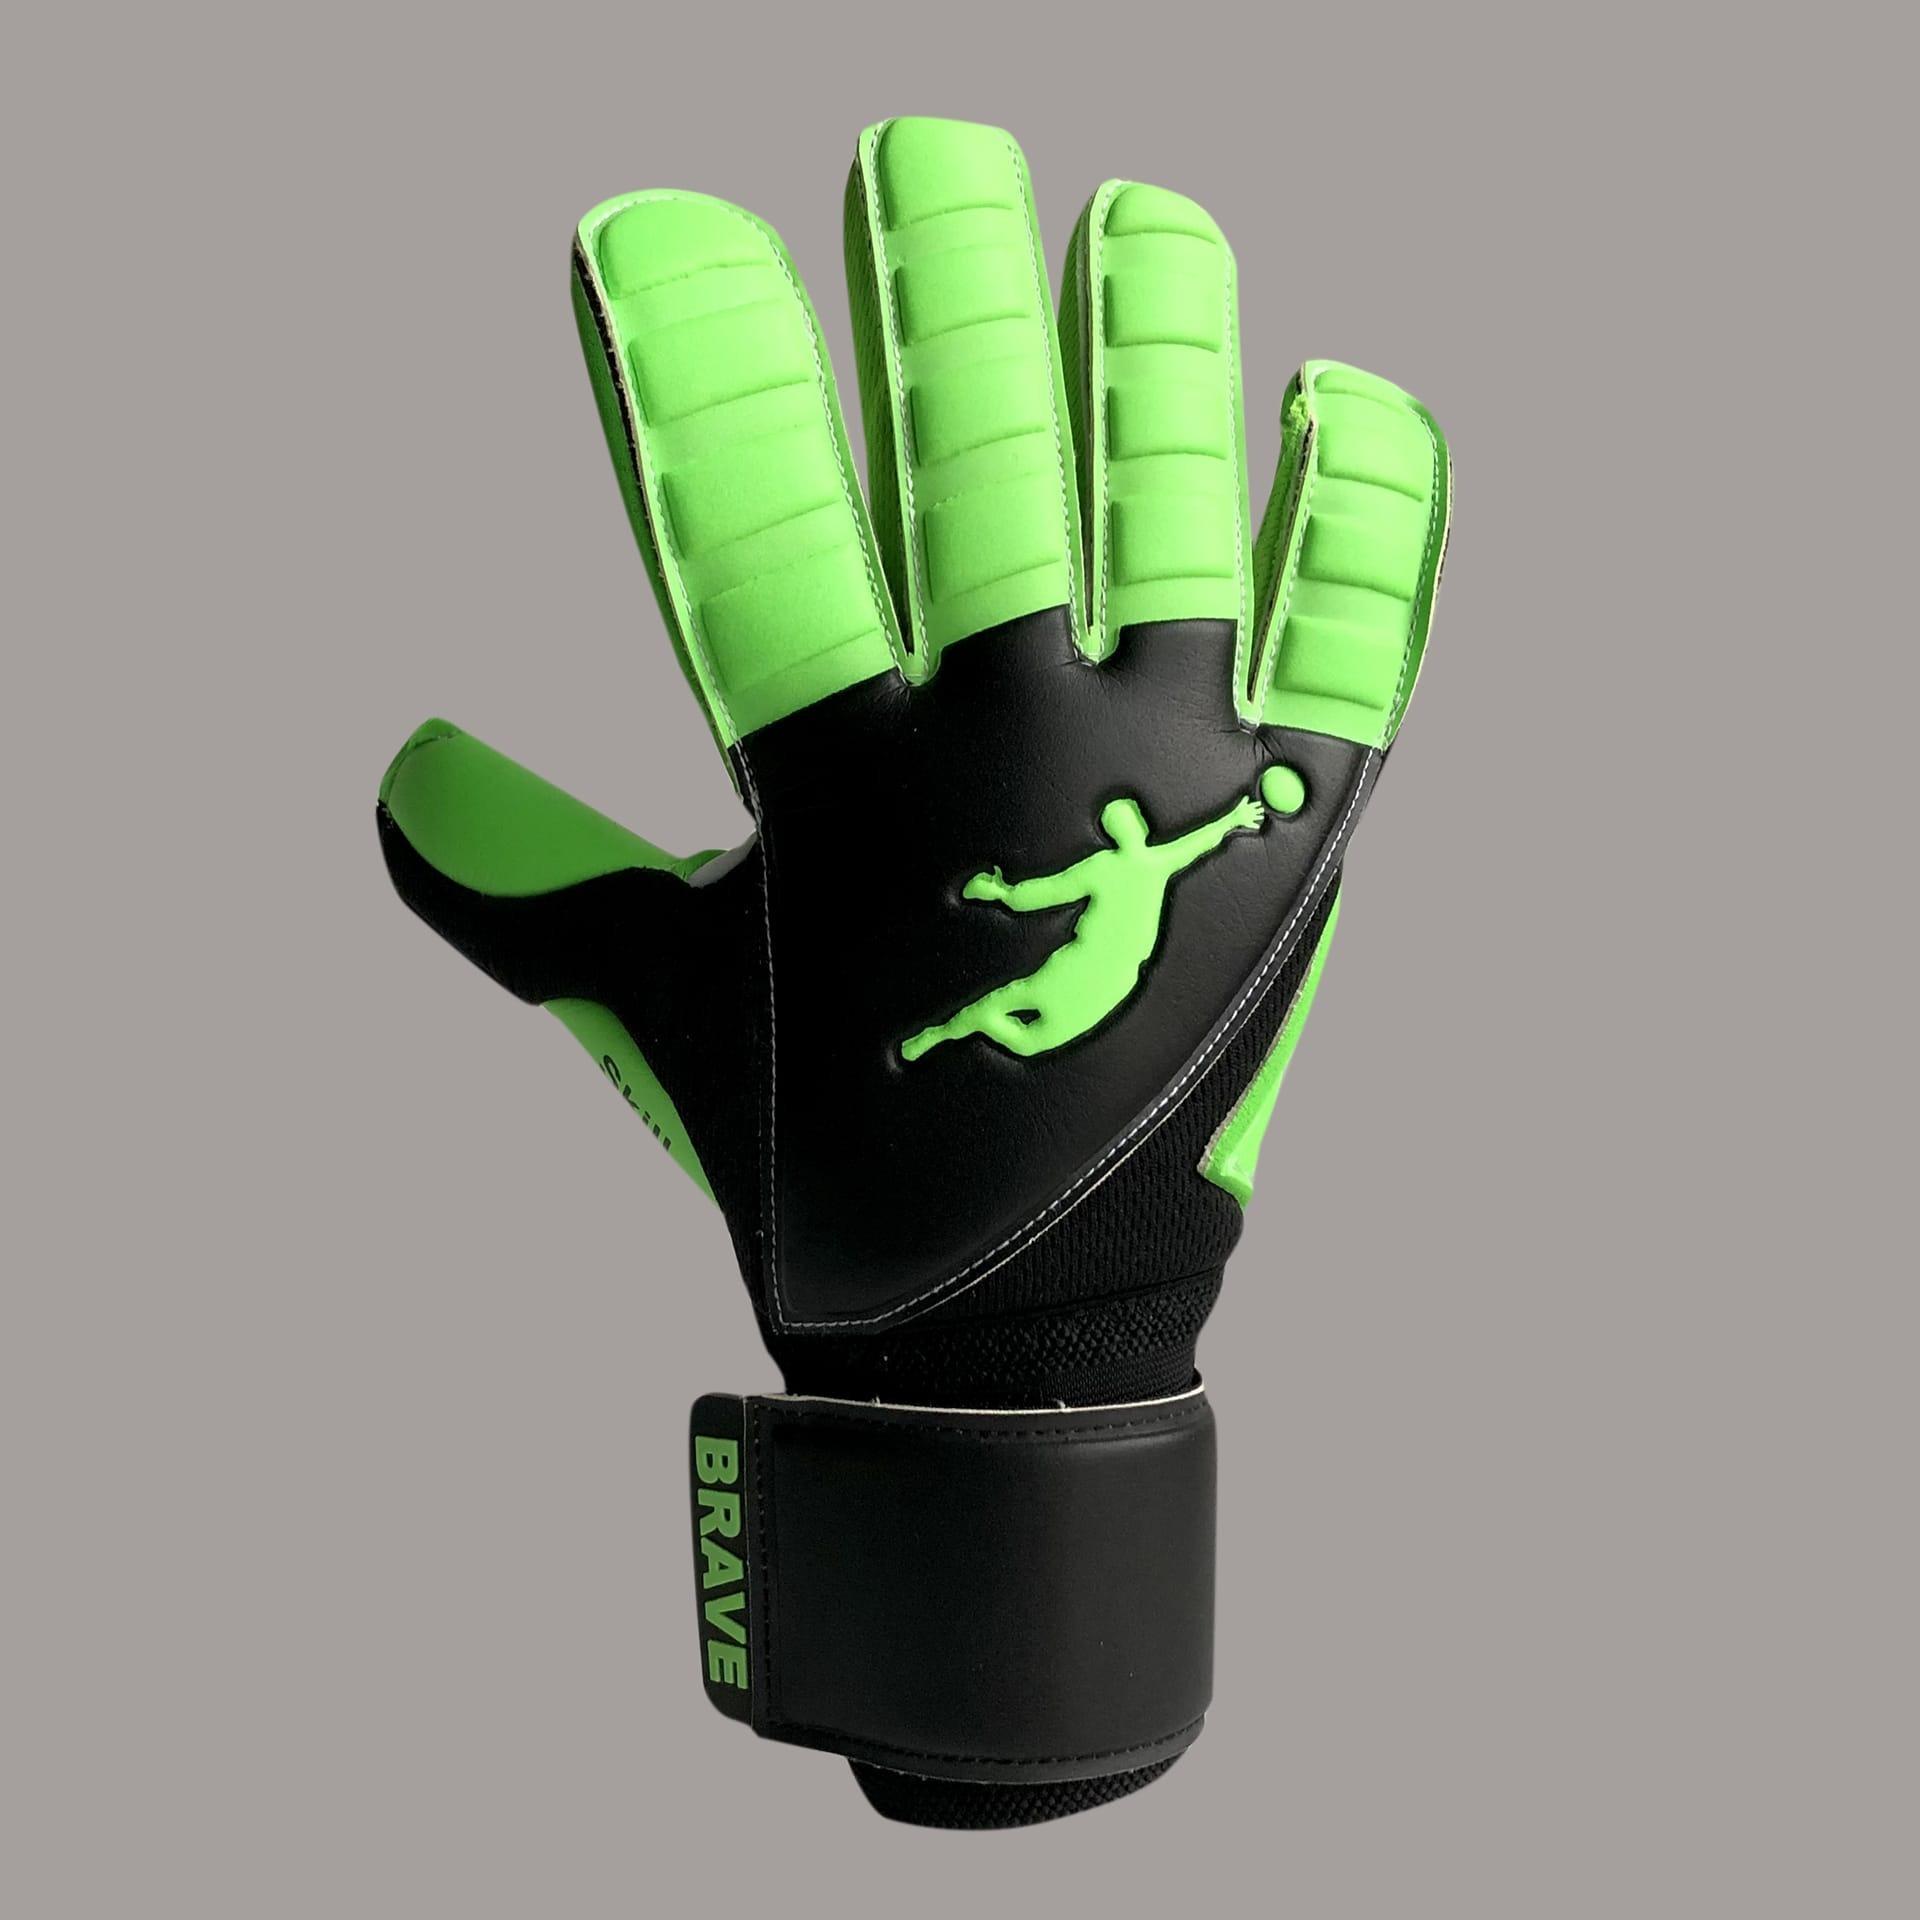 Перчатки Skill Green Flash - официальный интернет-магазин Brave GK